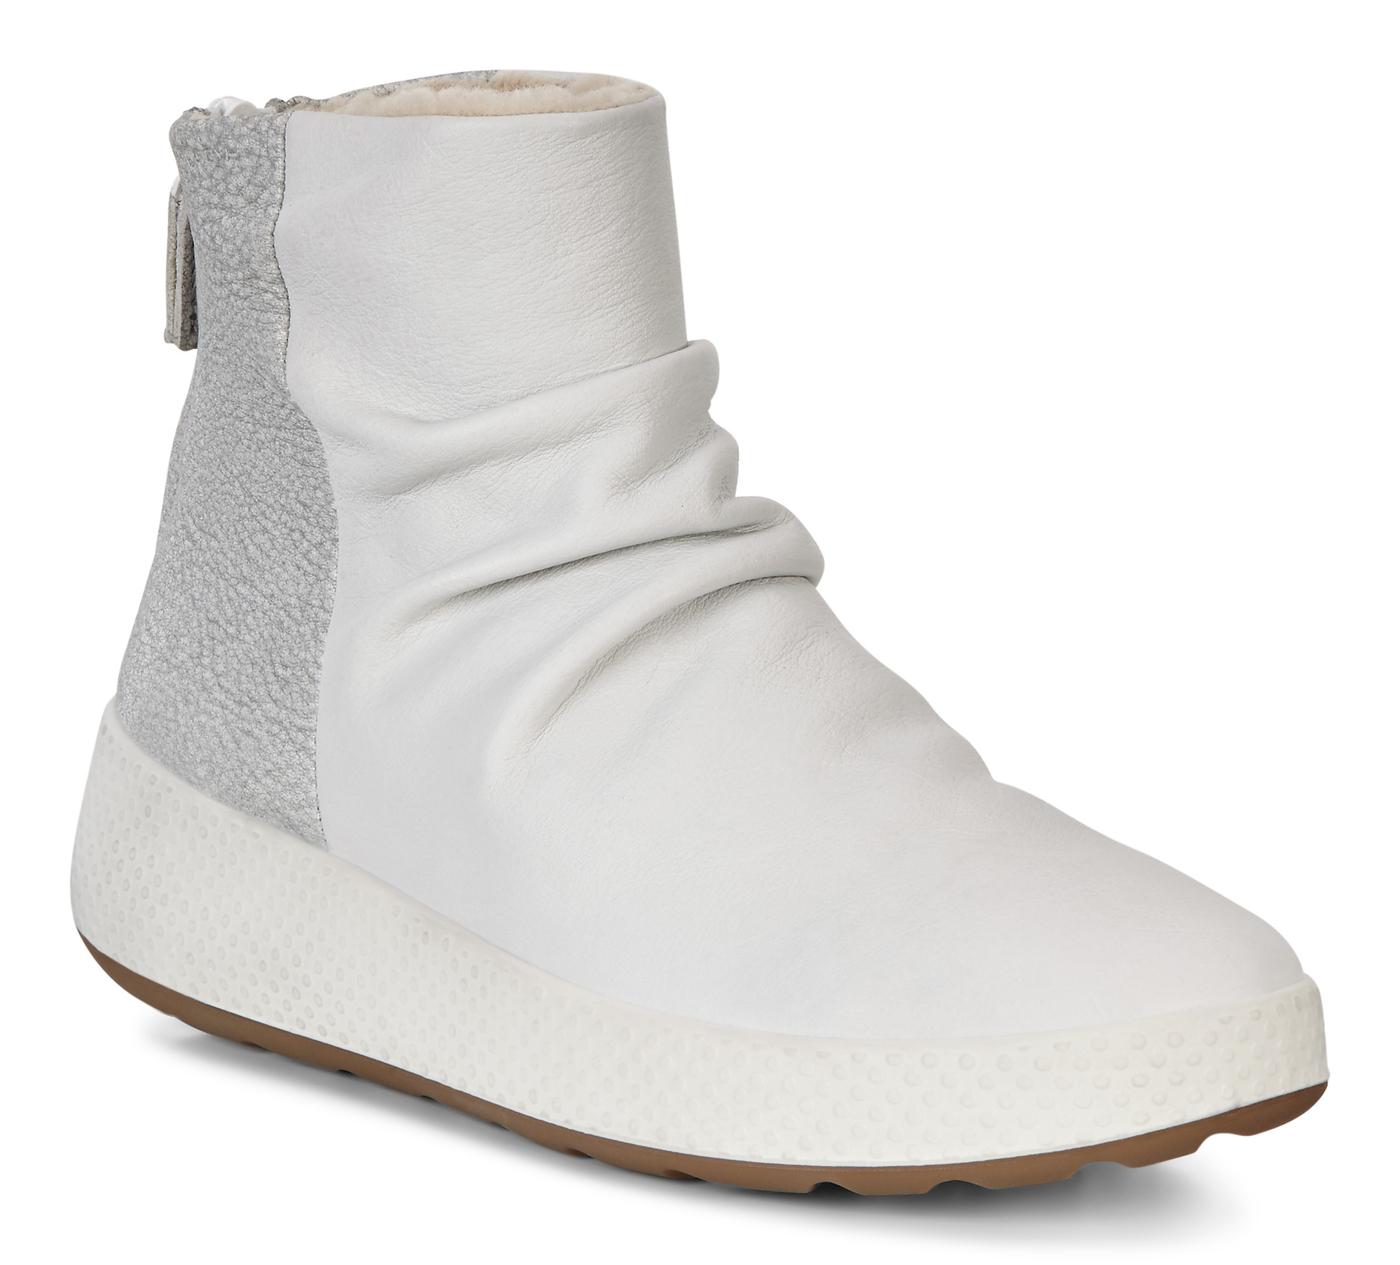 ECCO UKIUK Shinebright Backzip Ankle Boot